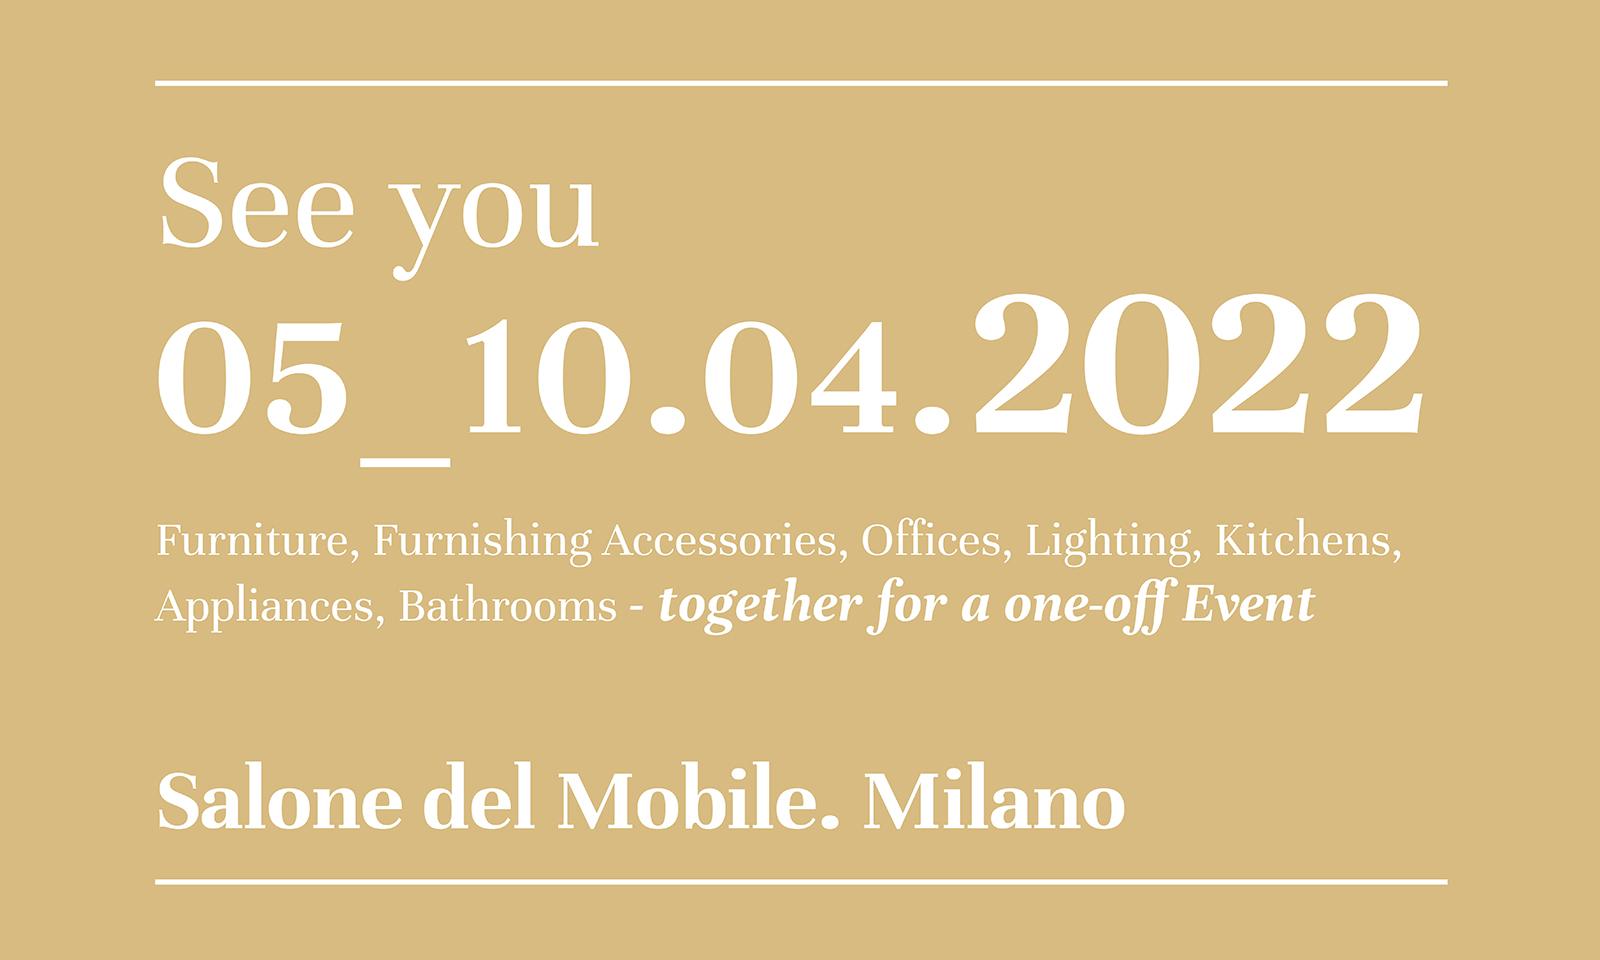 Next Milan Design week scheduled for April 5th-10th 2022